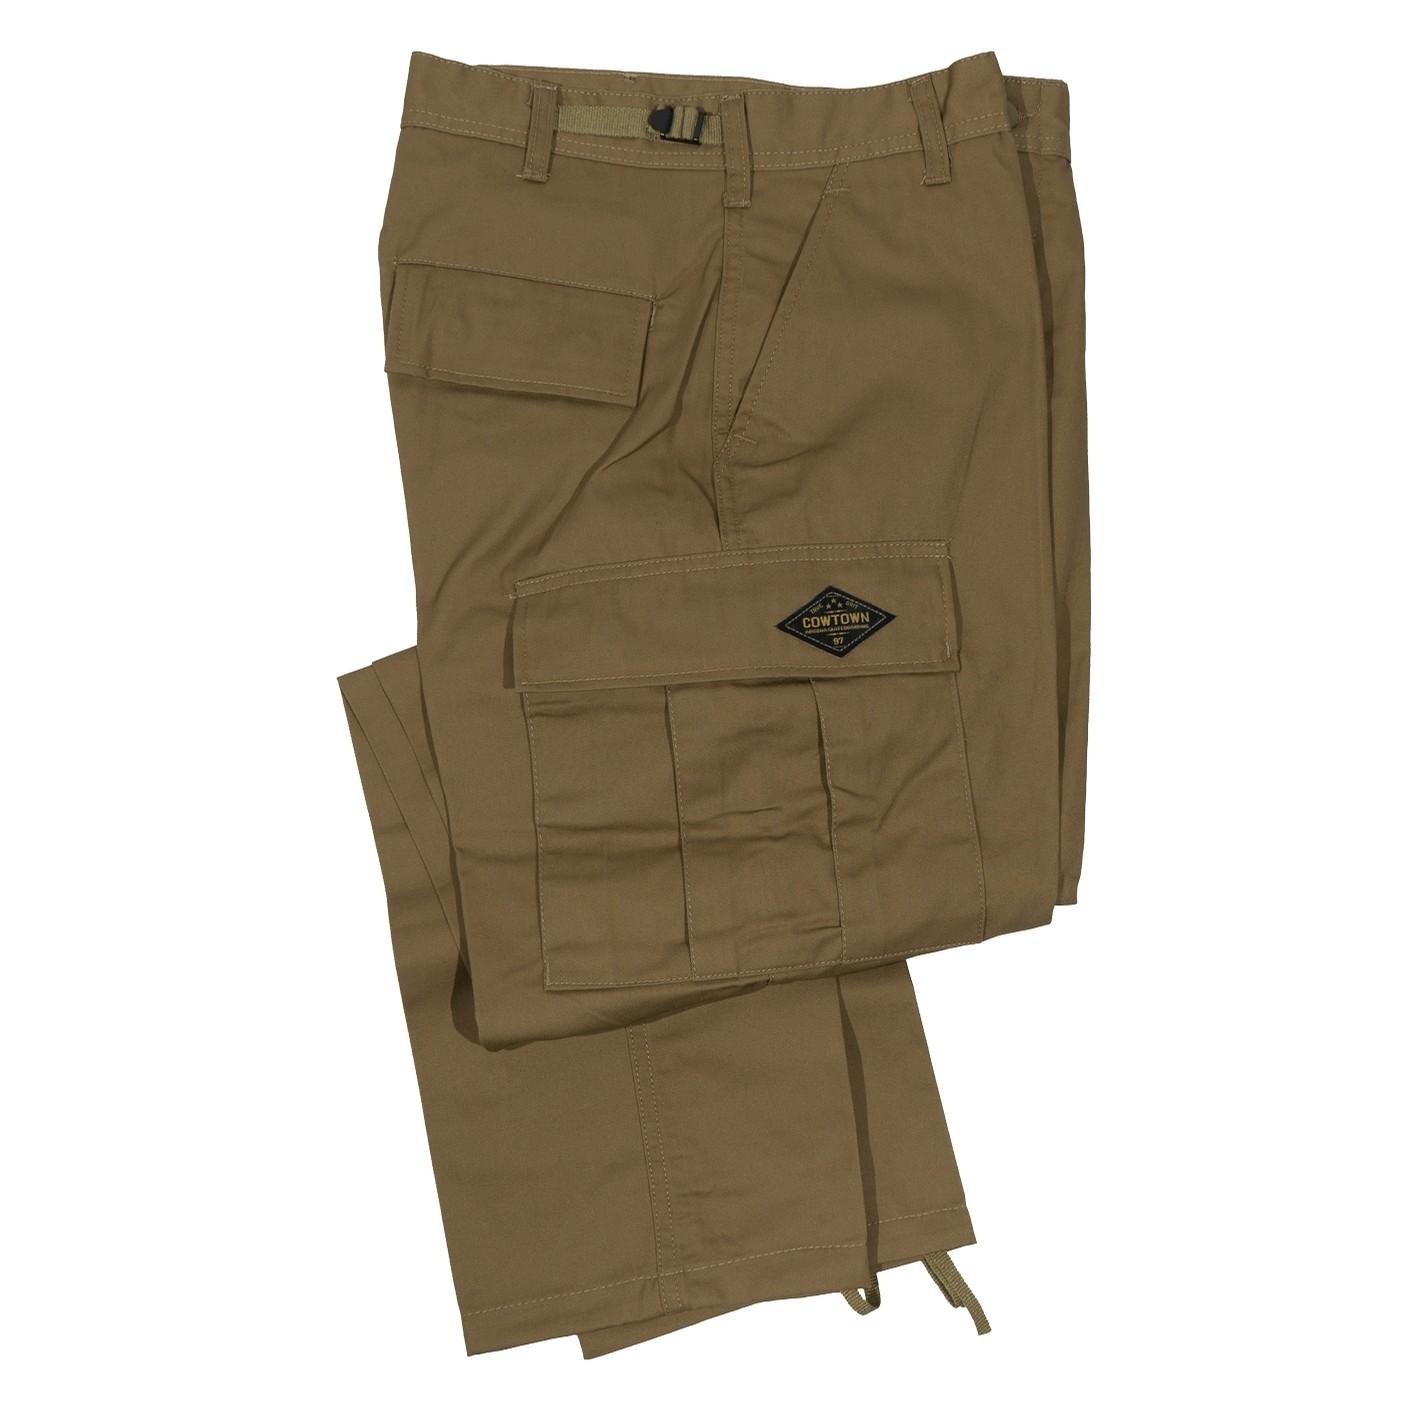 Cargo Pants (Coyote Brown)